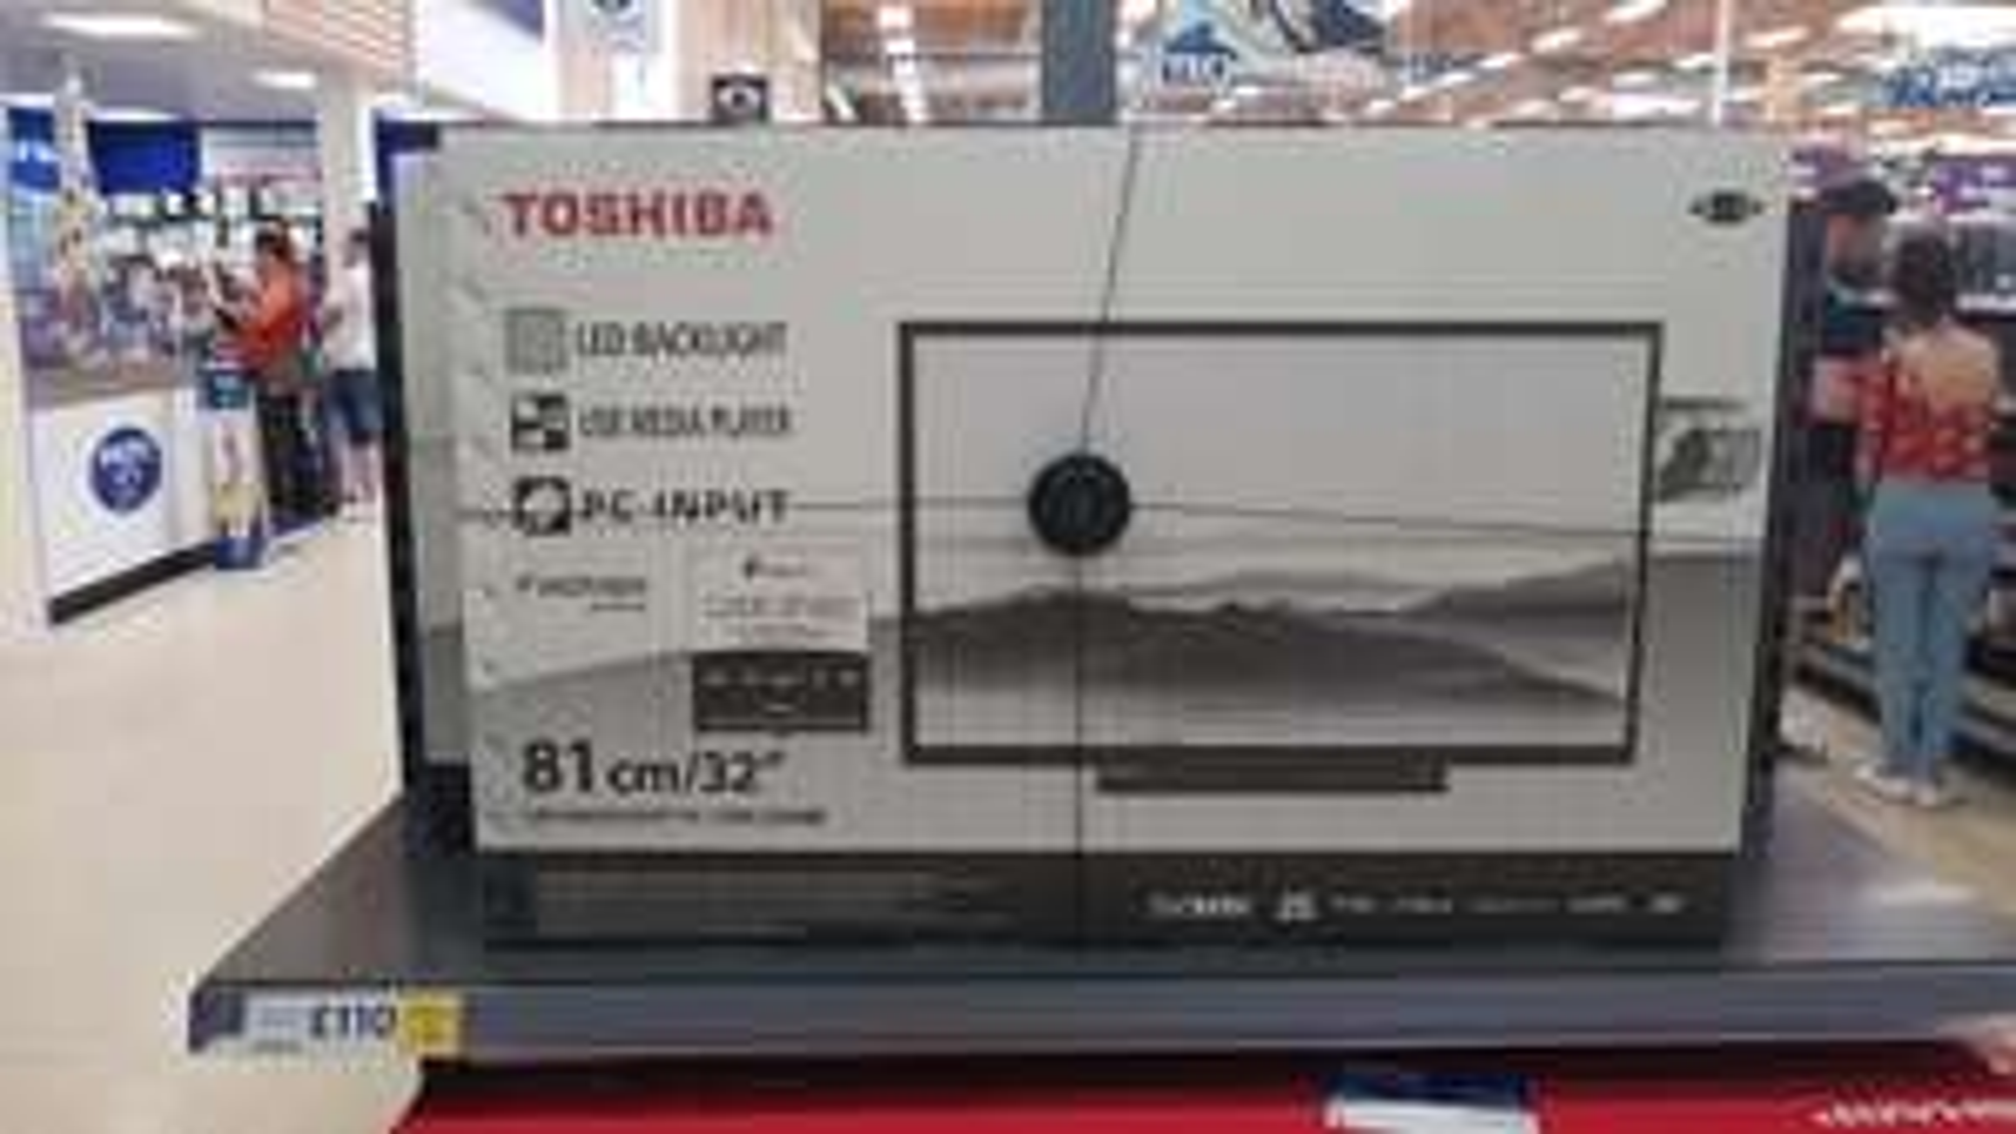 "Toshiba 32"" led tv & dvd £110 @ Tesco - Oldbury"